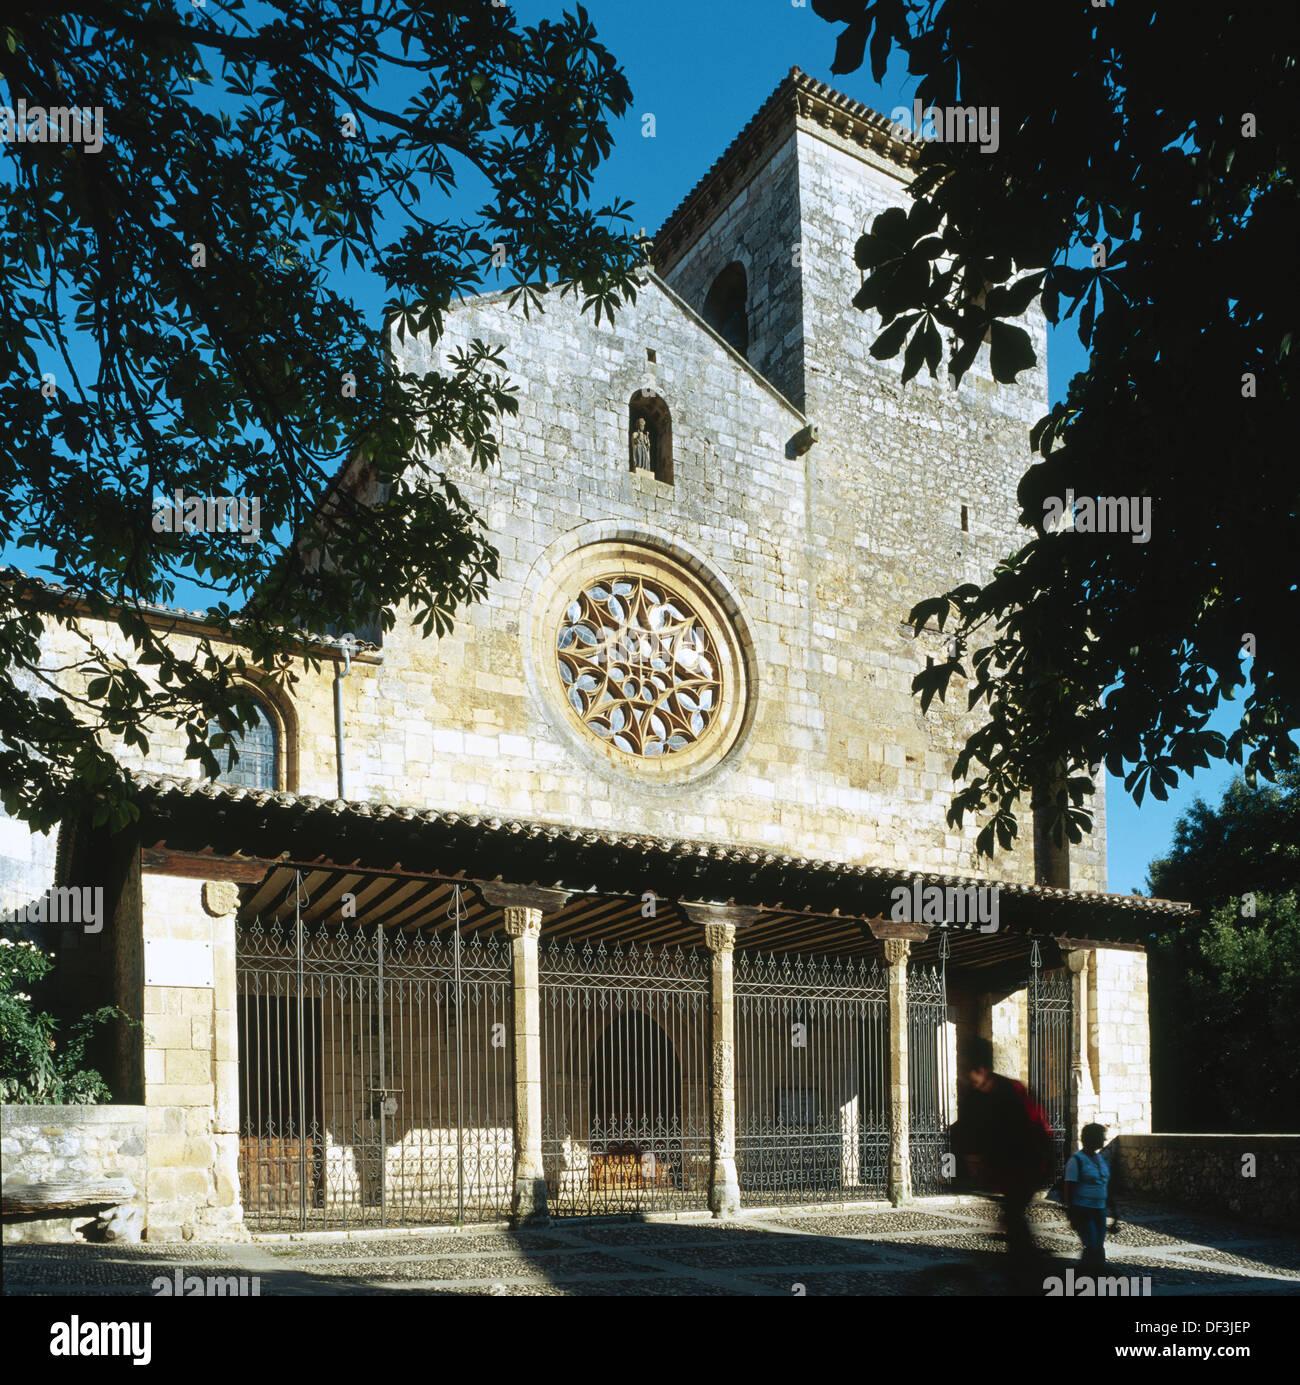 Collegiate church, Covarrubias. Ruta del Cid, Burgos province, Castilla-Léon, Spain - Stock Image